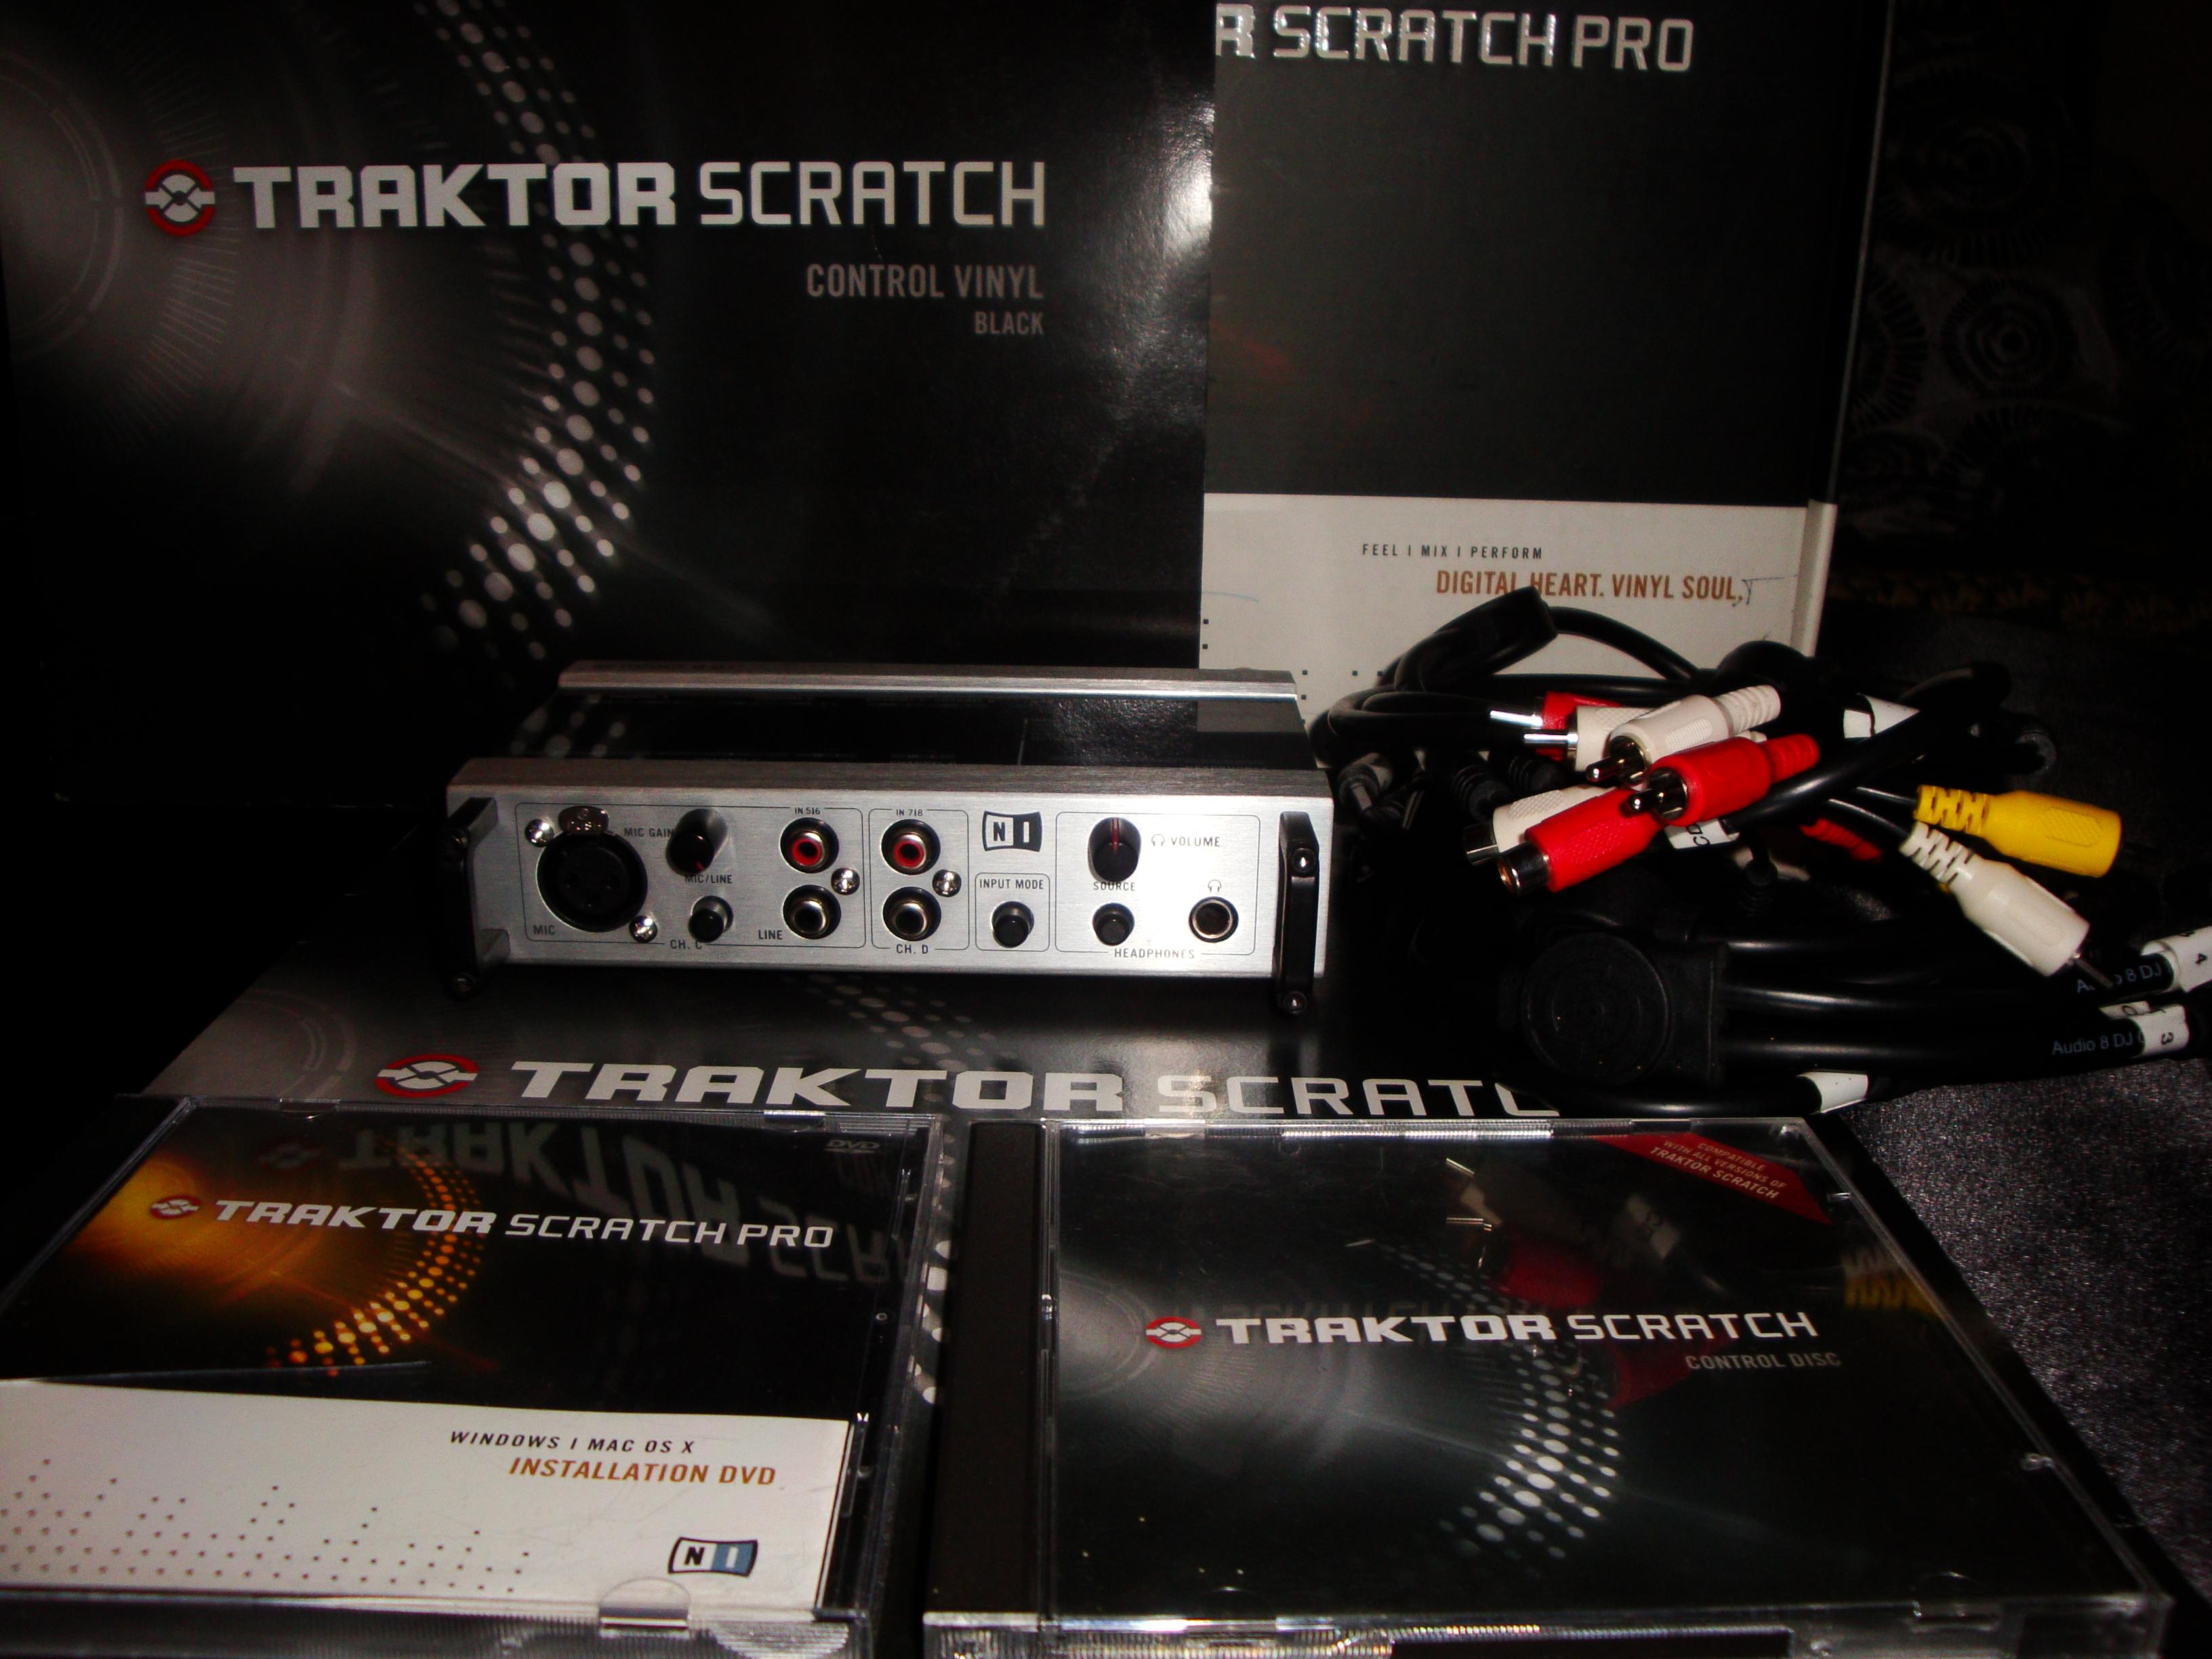 traktor scratch pro 2 with audio 8. Black Bedroom Furniture Sets. Home Design Ideas